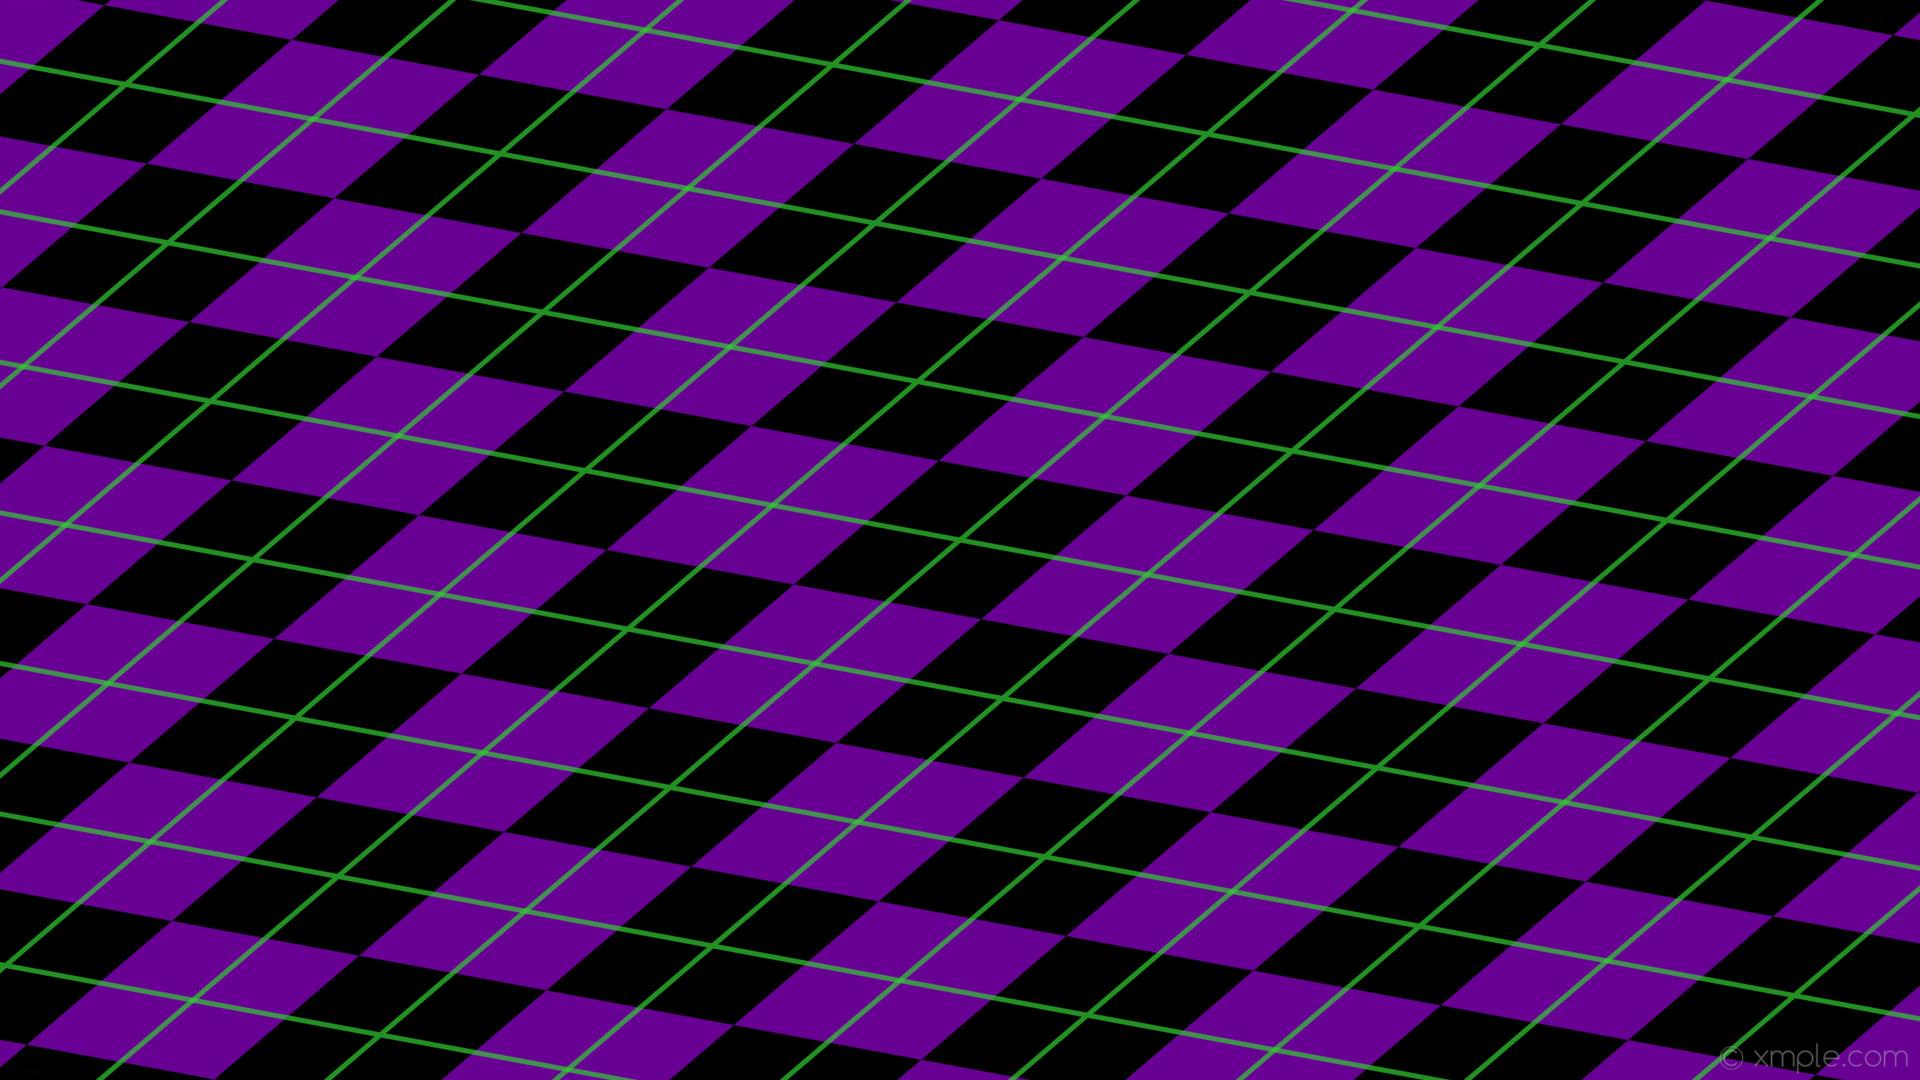 wallpaper green diamonds lines purple argyle black dark violet lime green  #000000 #9400d3 #